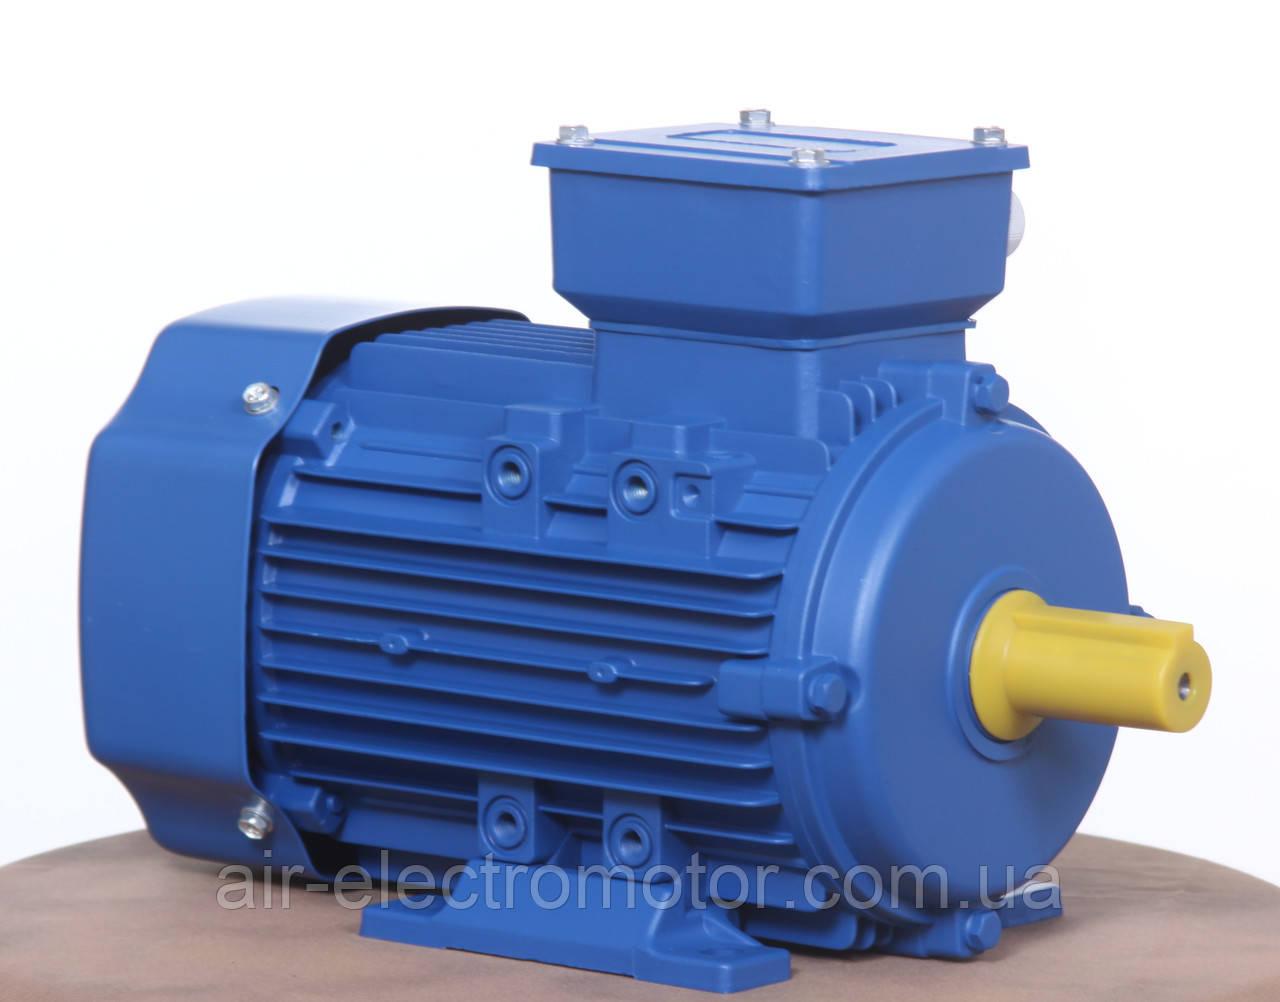 Электродвигатель АИР80А4 - 1,1кВт/ 1500 об/мин